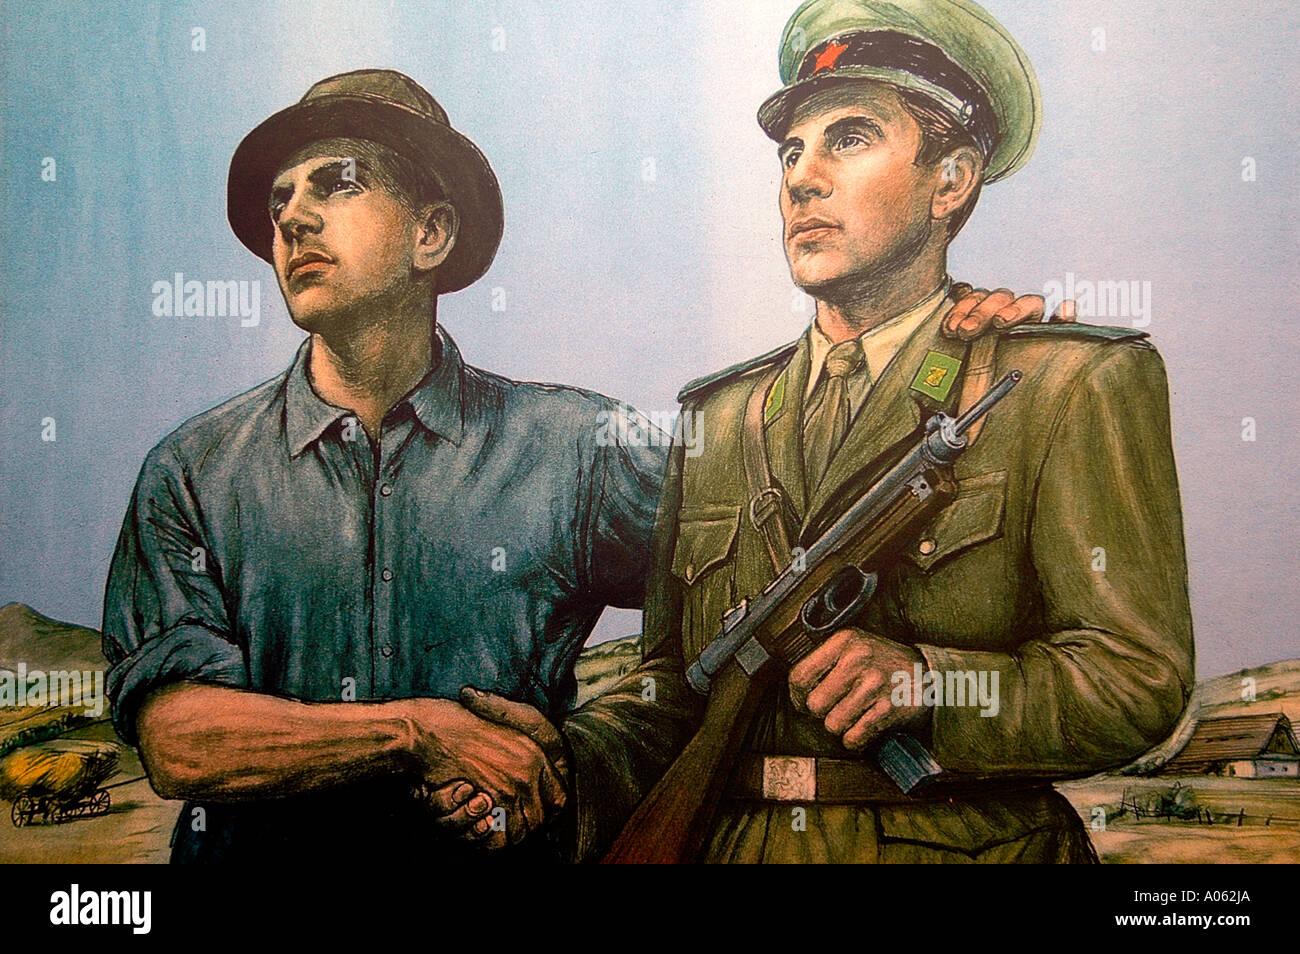 Socialist Realism Political Art Oil painting Czech - Stock Image